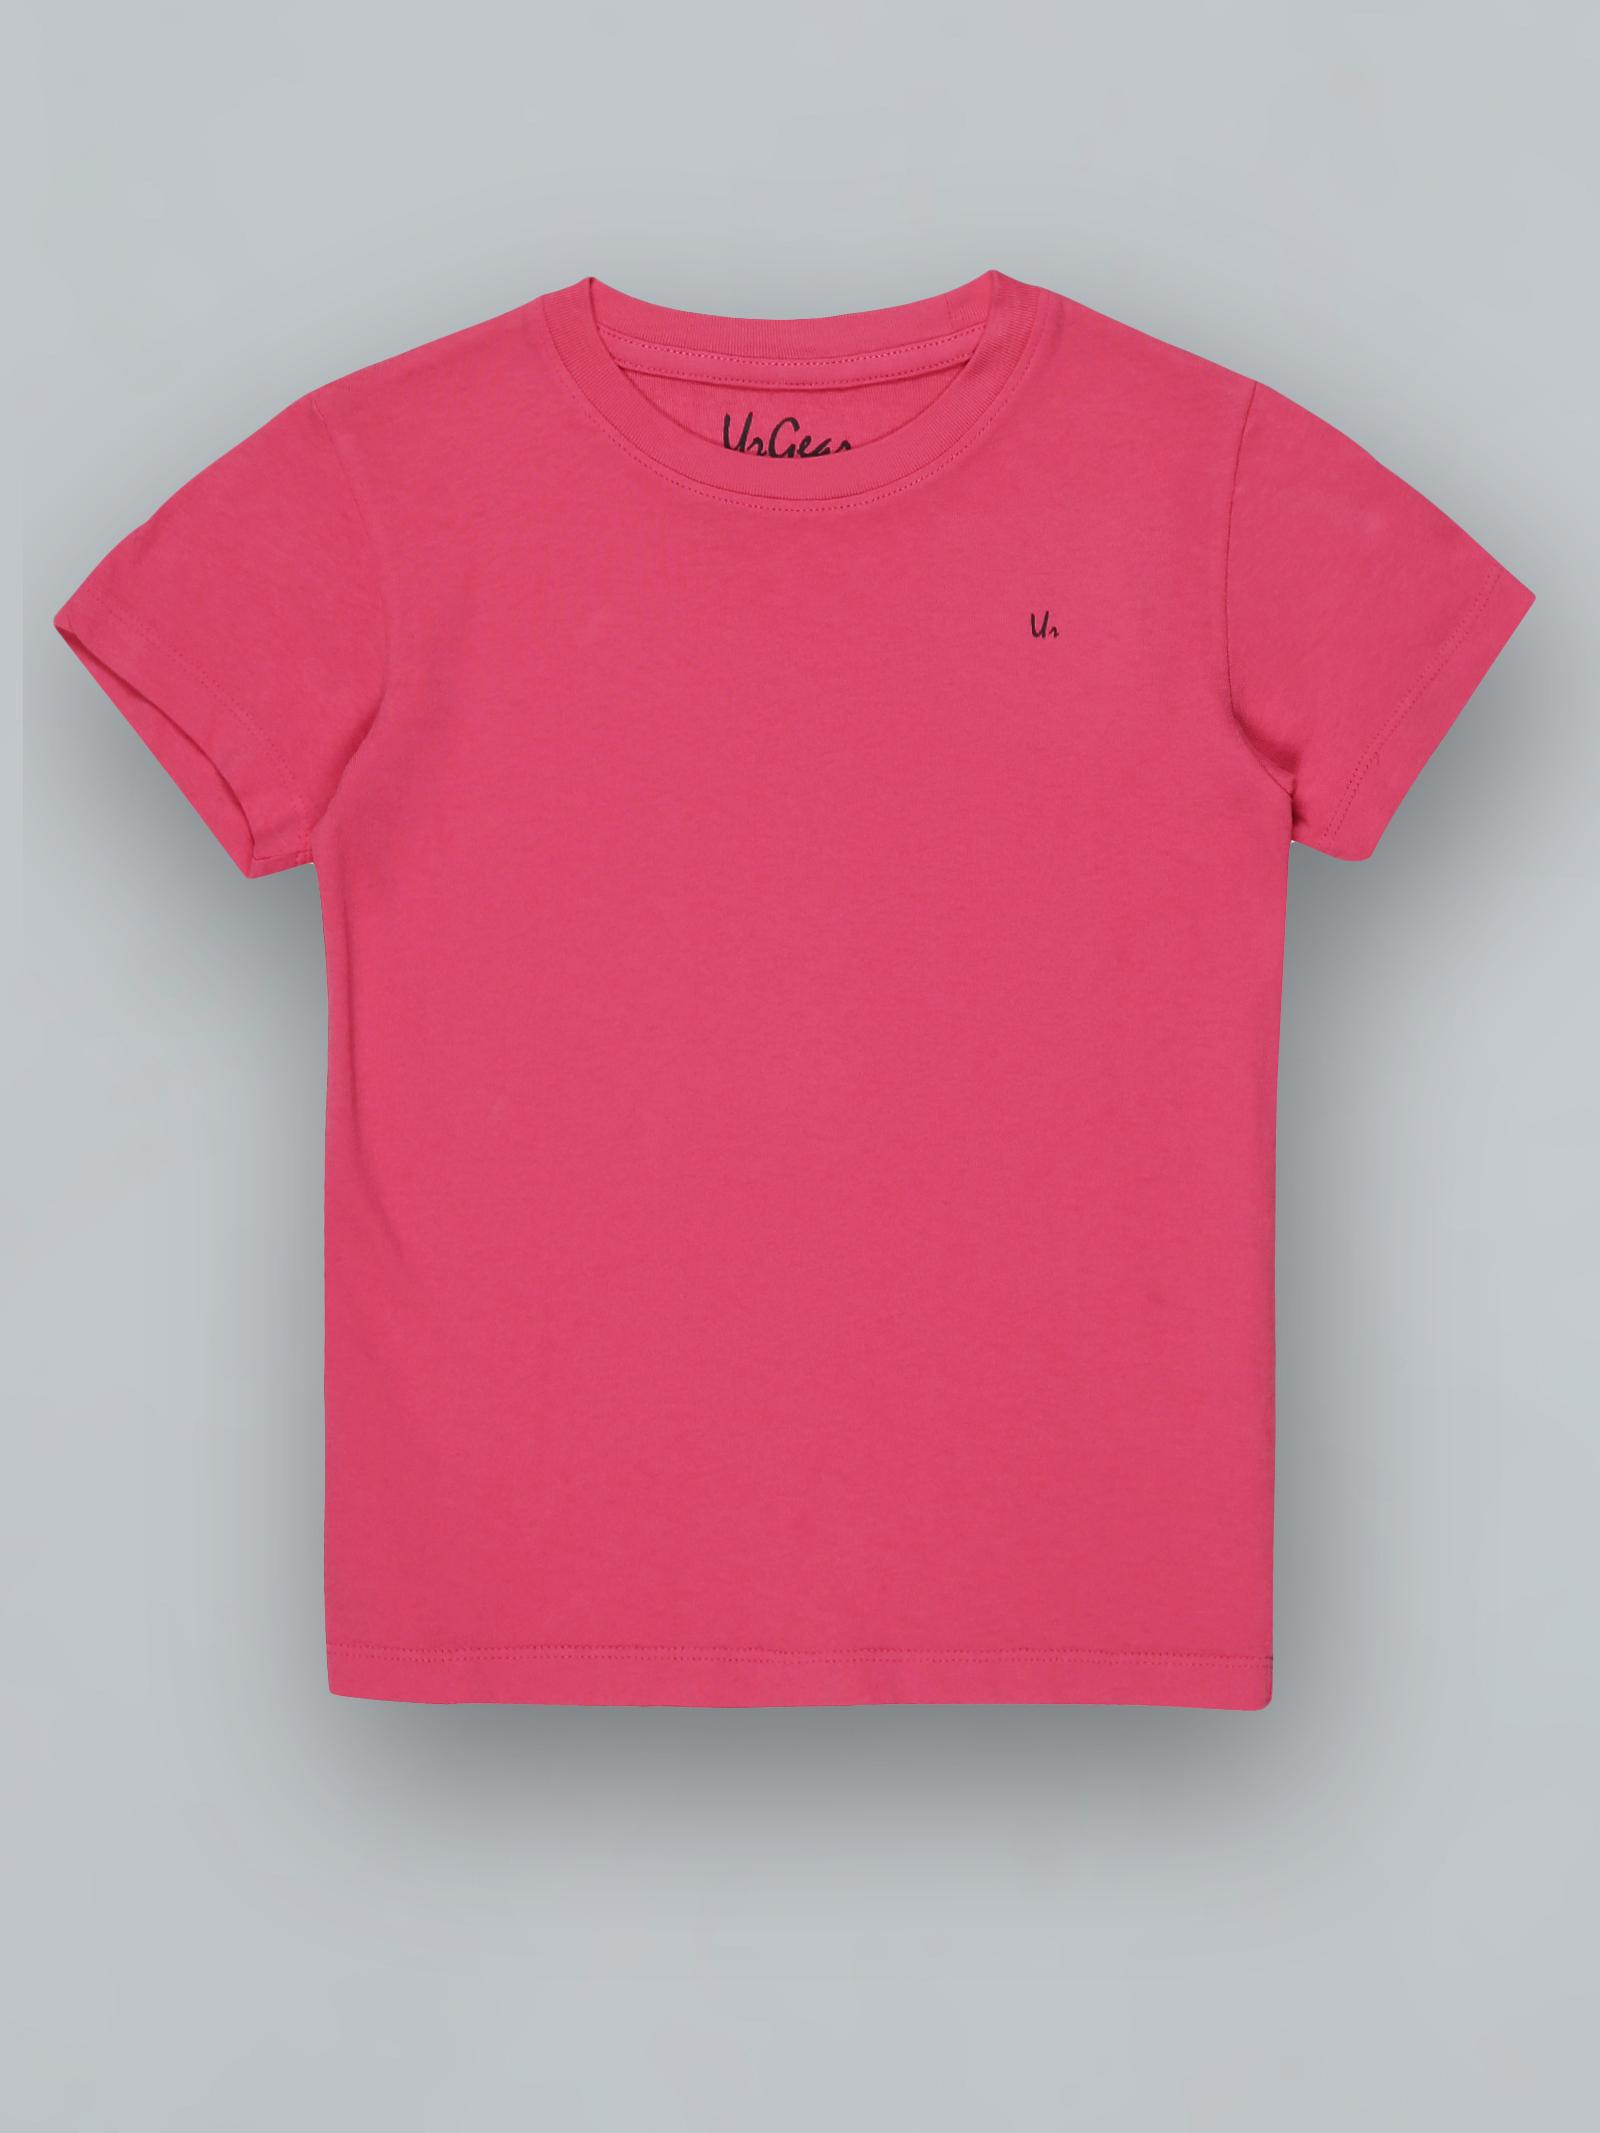 UrGear   UrGear Baby Boys & Baby Girls Solid Pure Cotton T Shirt